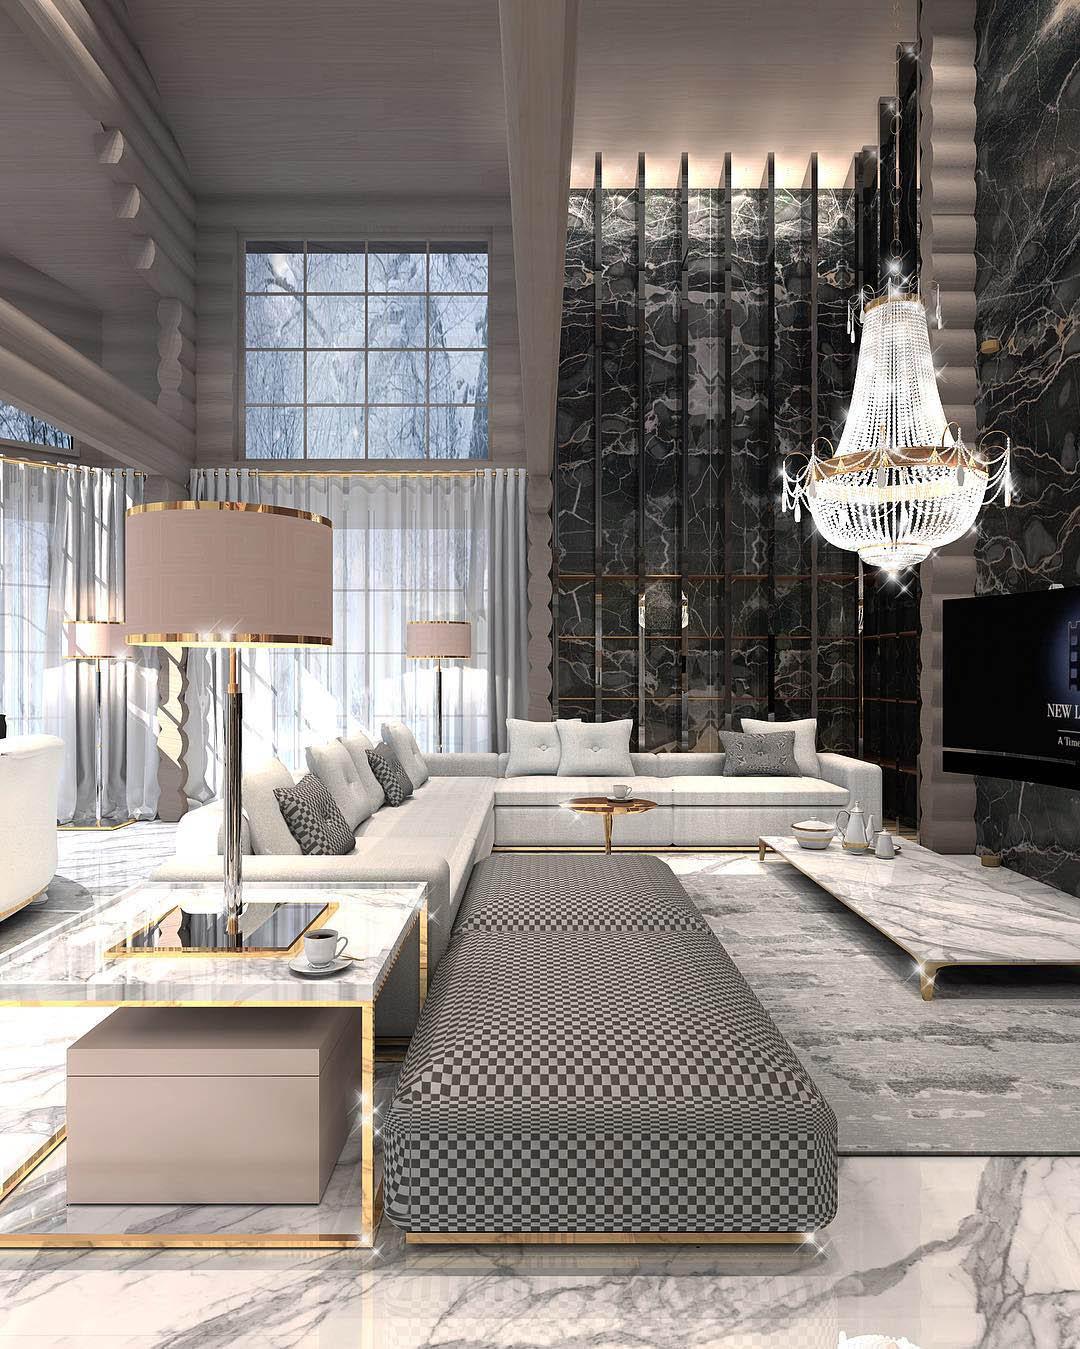 Constantin Frolov Interior Design | Glamorous Residential Interiors